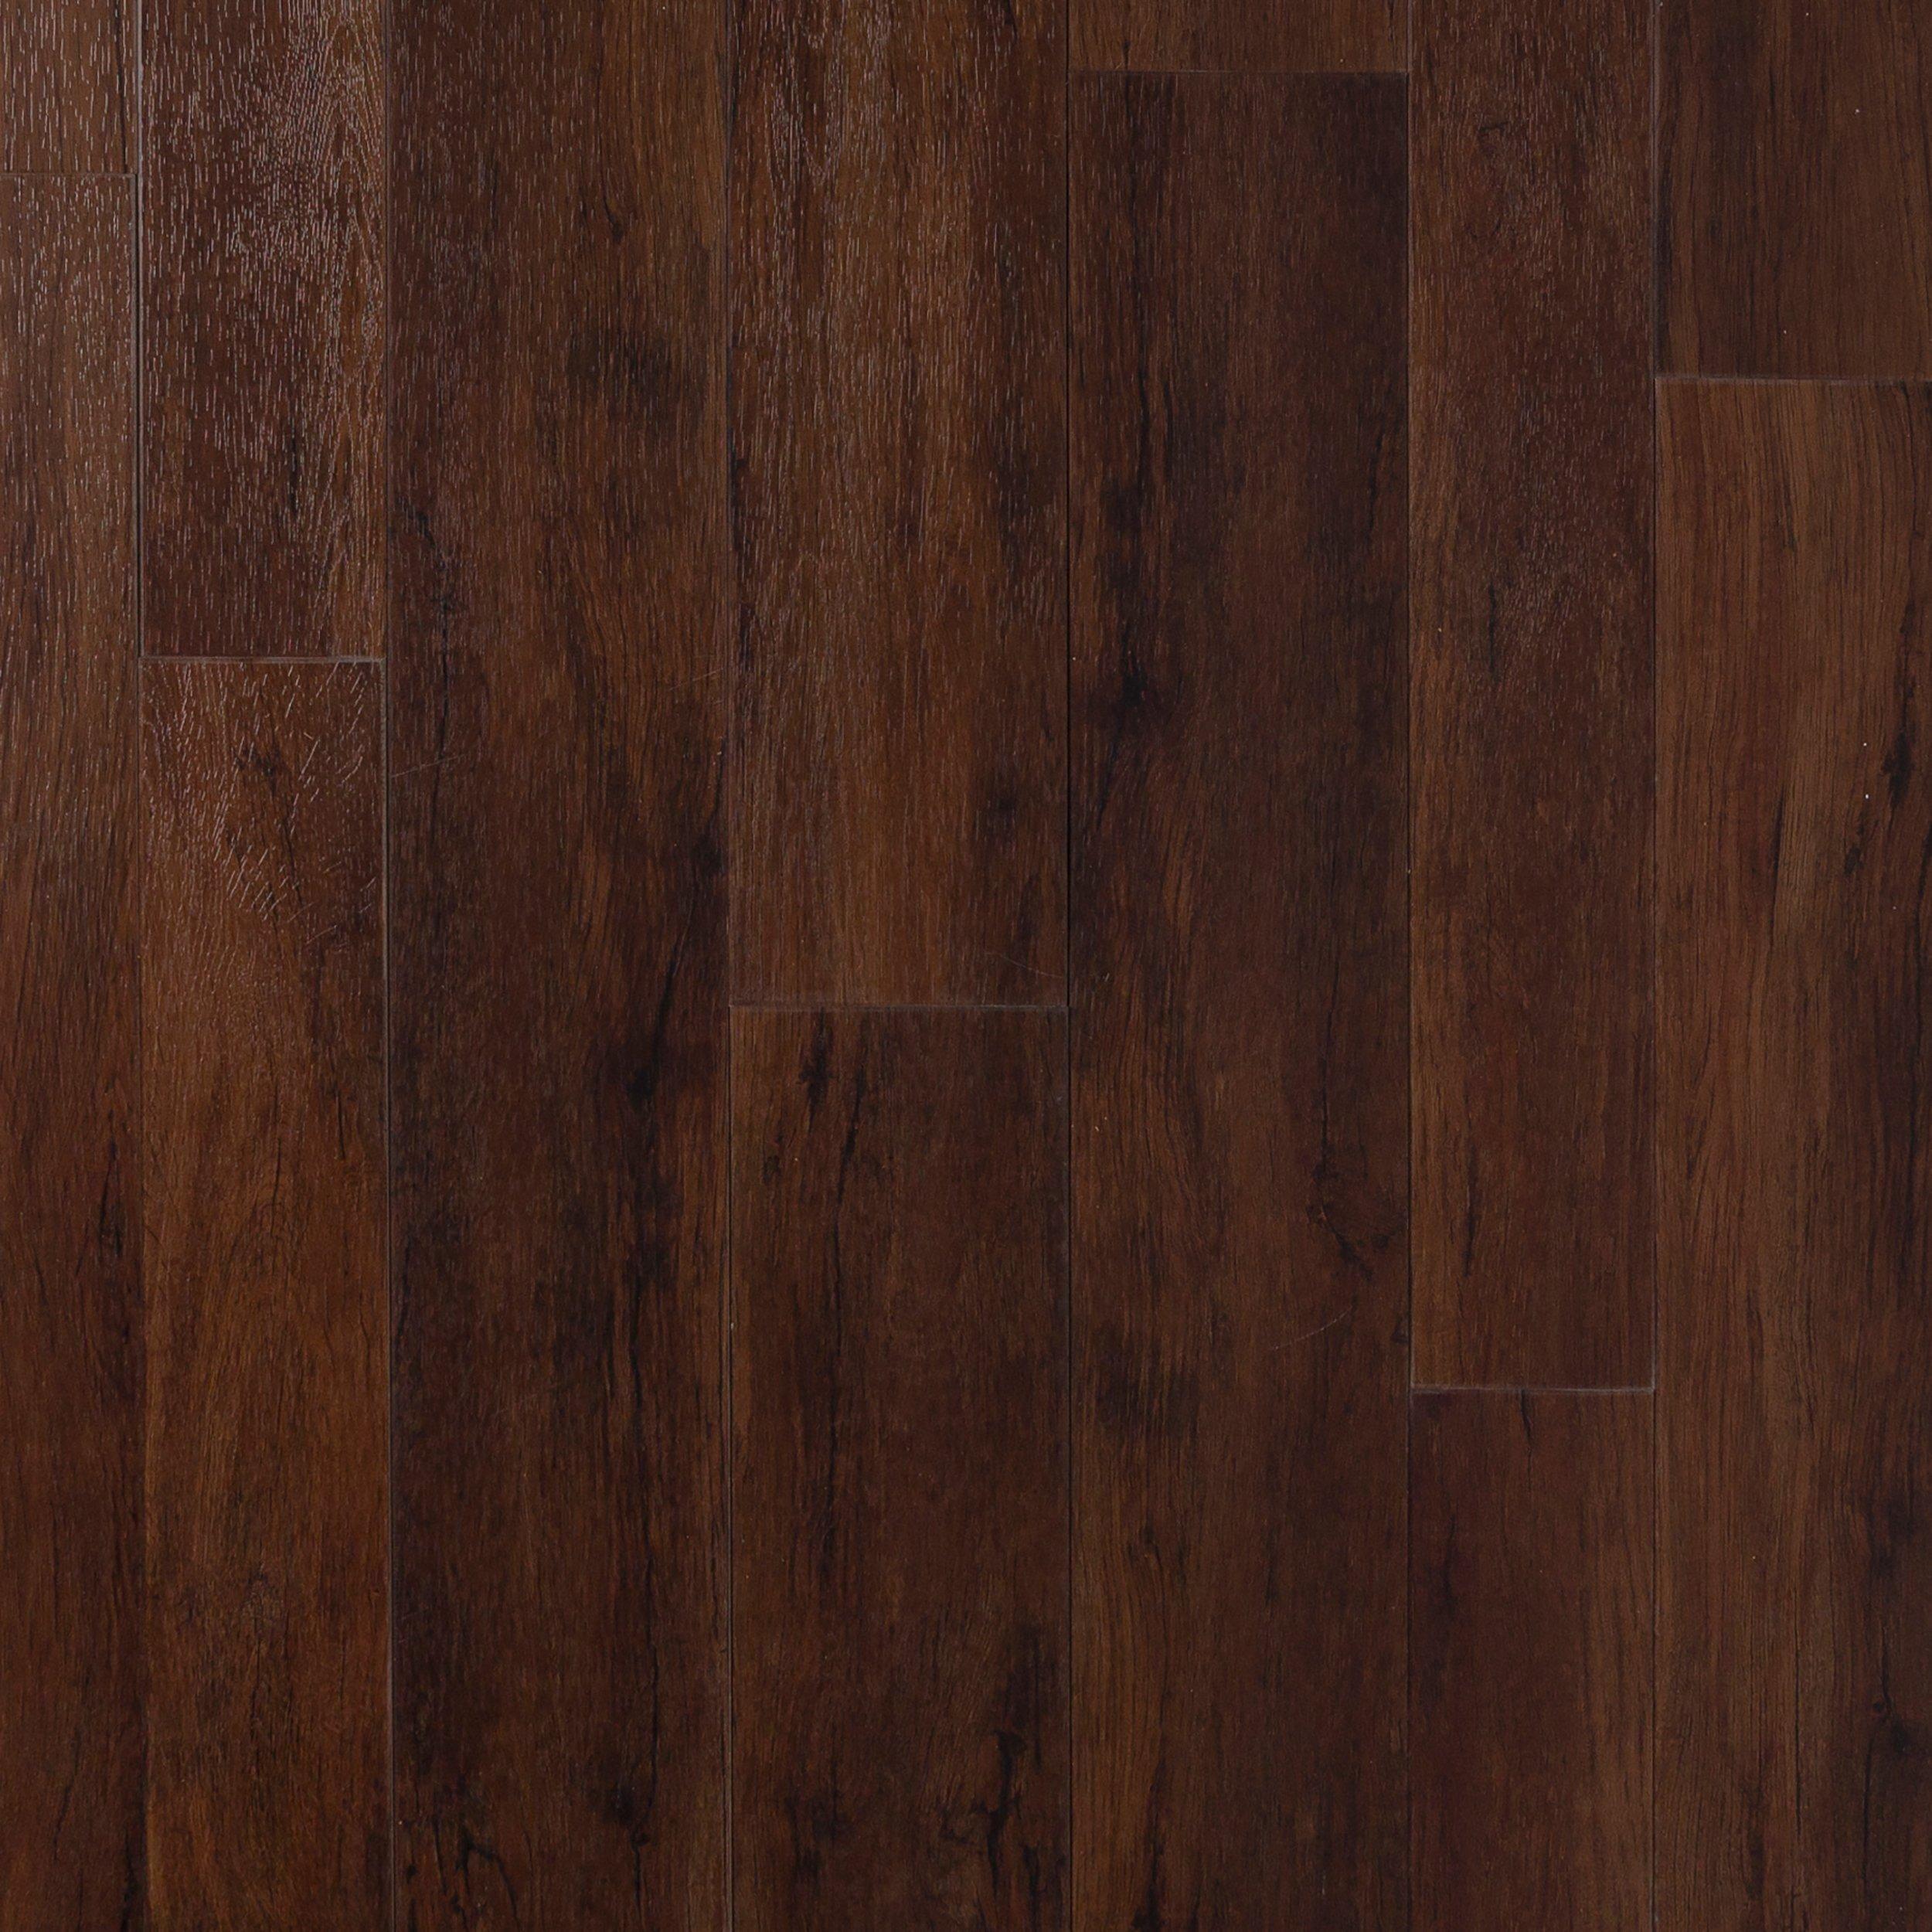 Midtown Oak Rigid Core Luxury Vinyl Plank Cork Back In 2020 Vinyl Plank Flooring Luxury Vinyl Plank